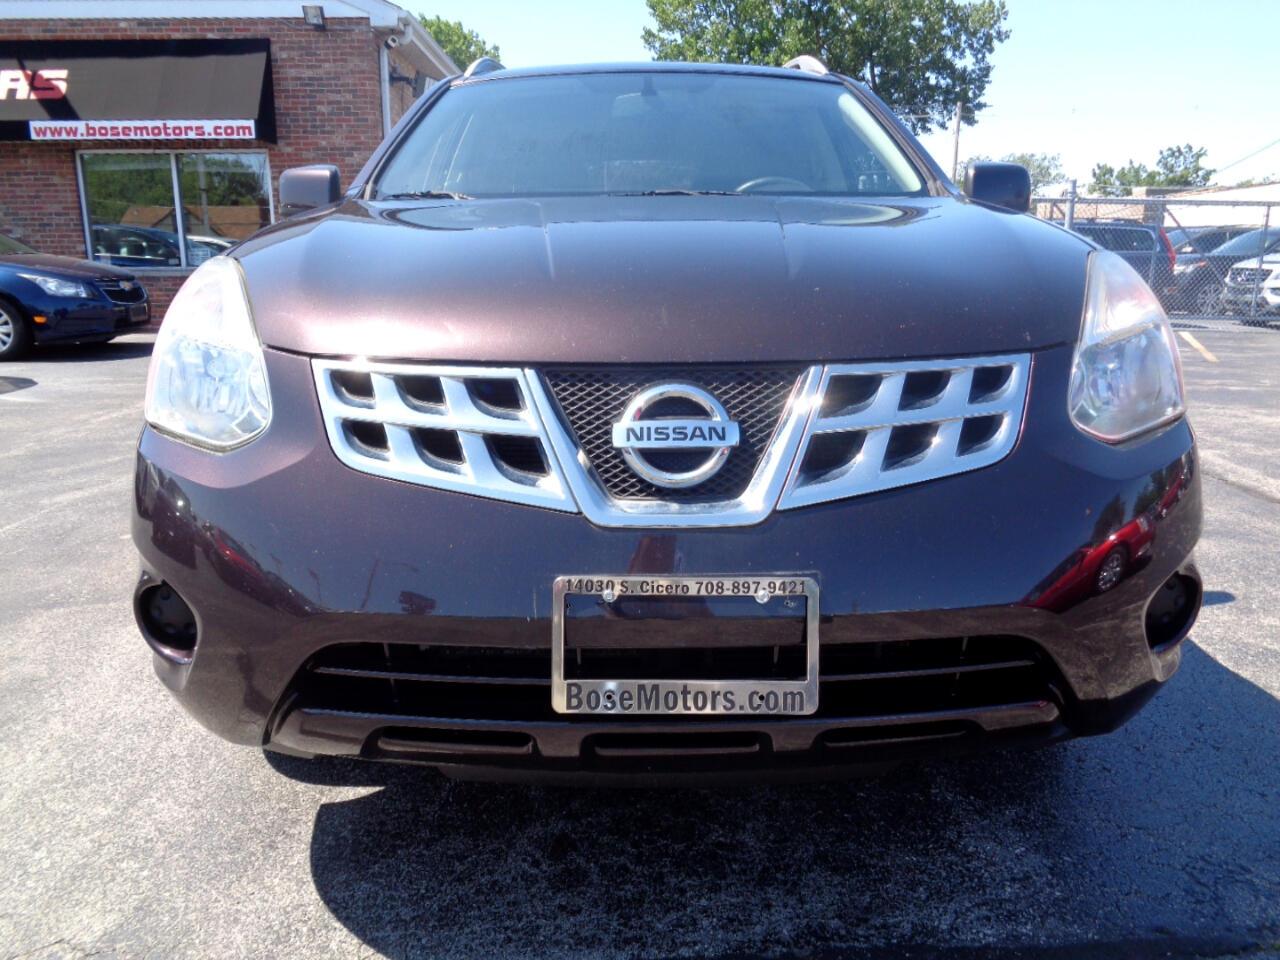 Nissan Rogue S AWD 2012